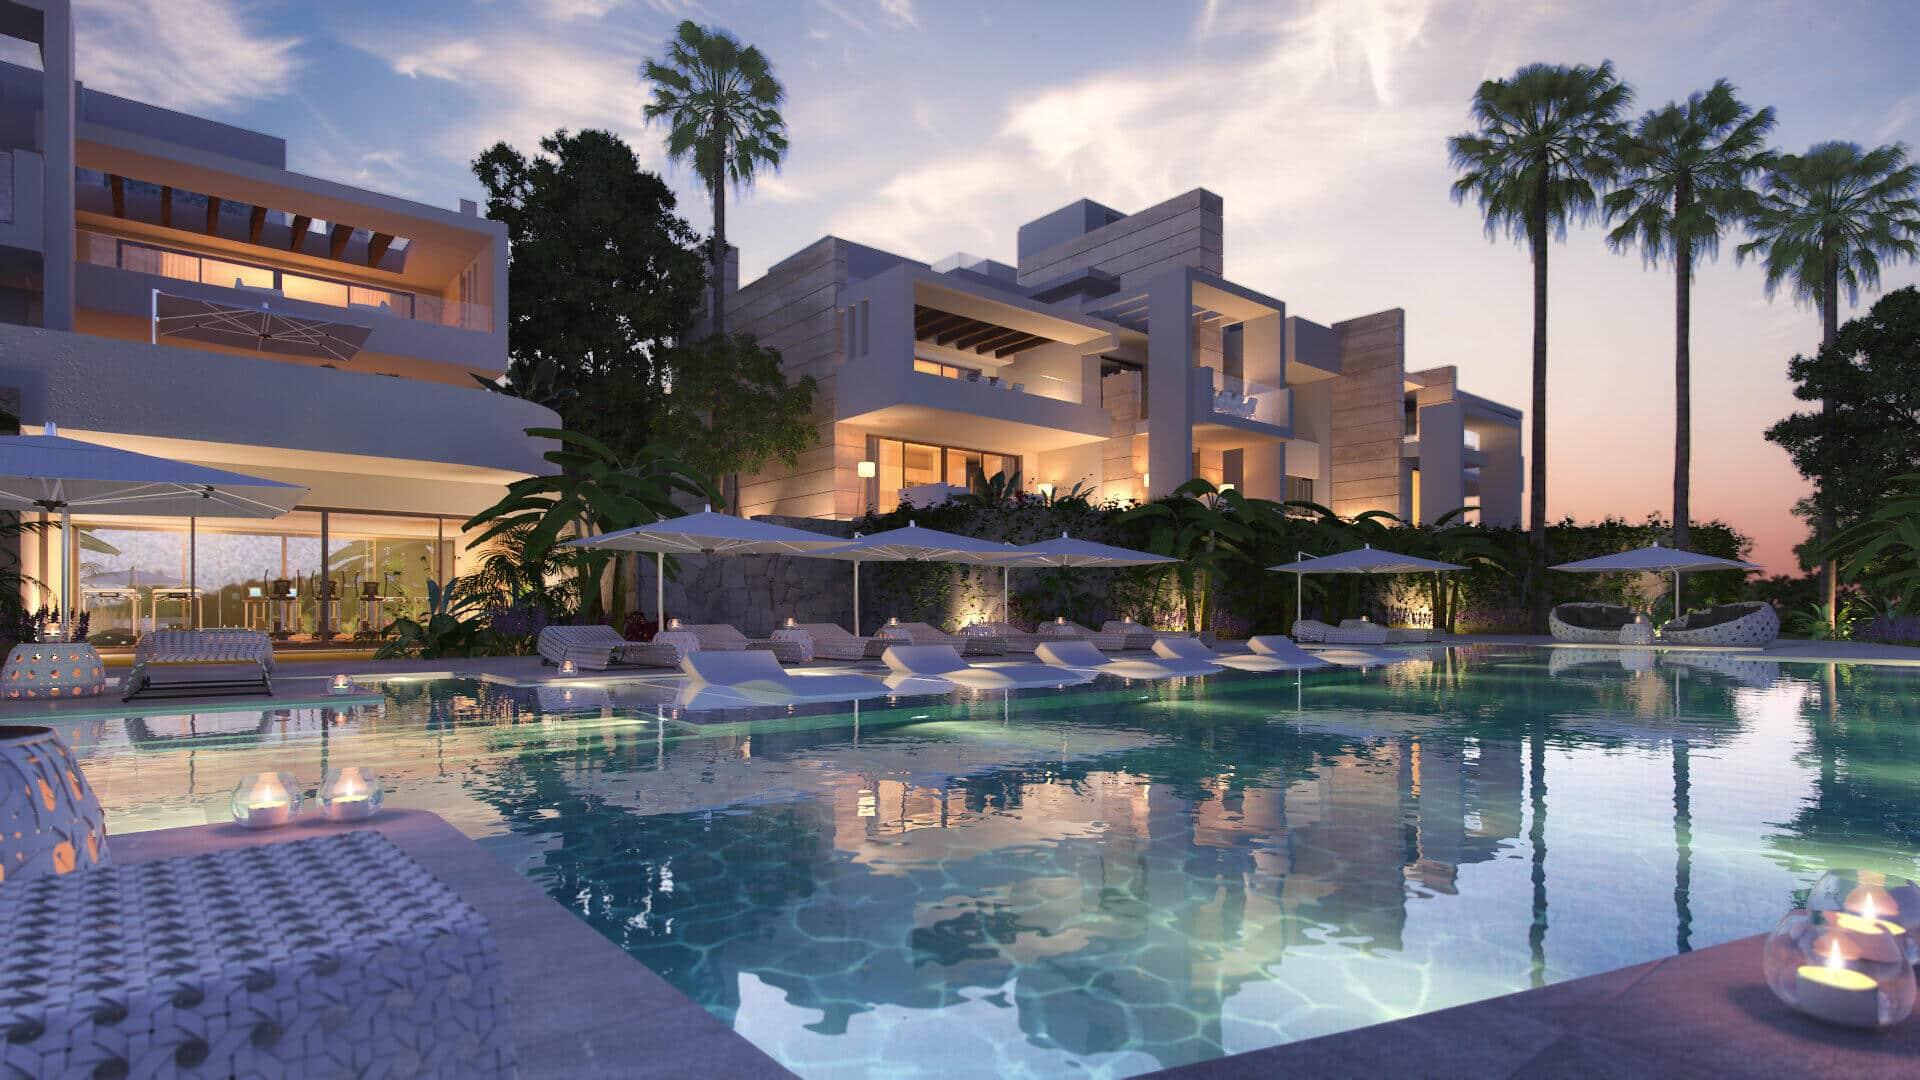 Palo Alto Los Pinsapos Apartment Penthouse Marbella | Realista